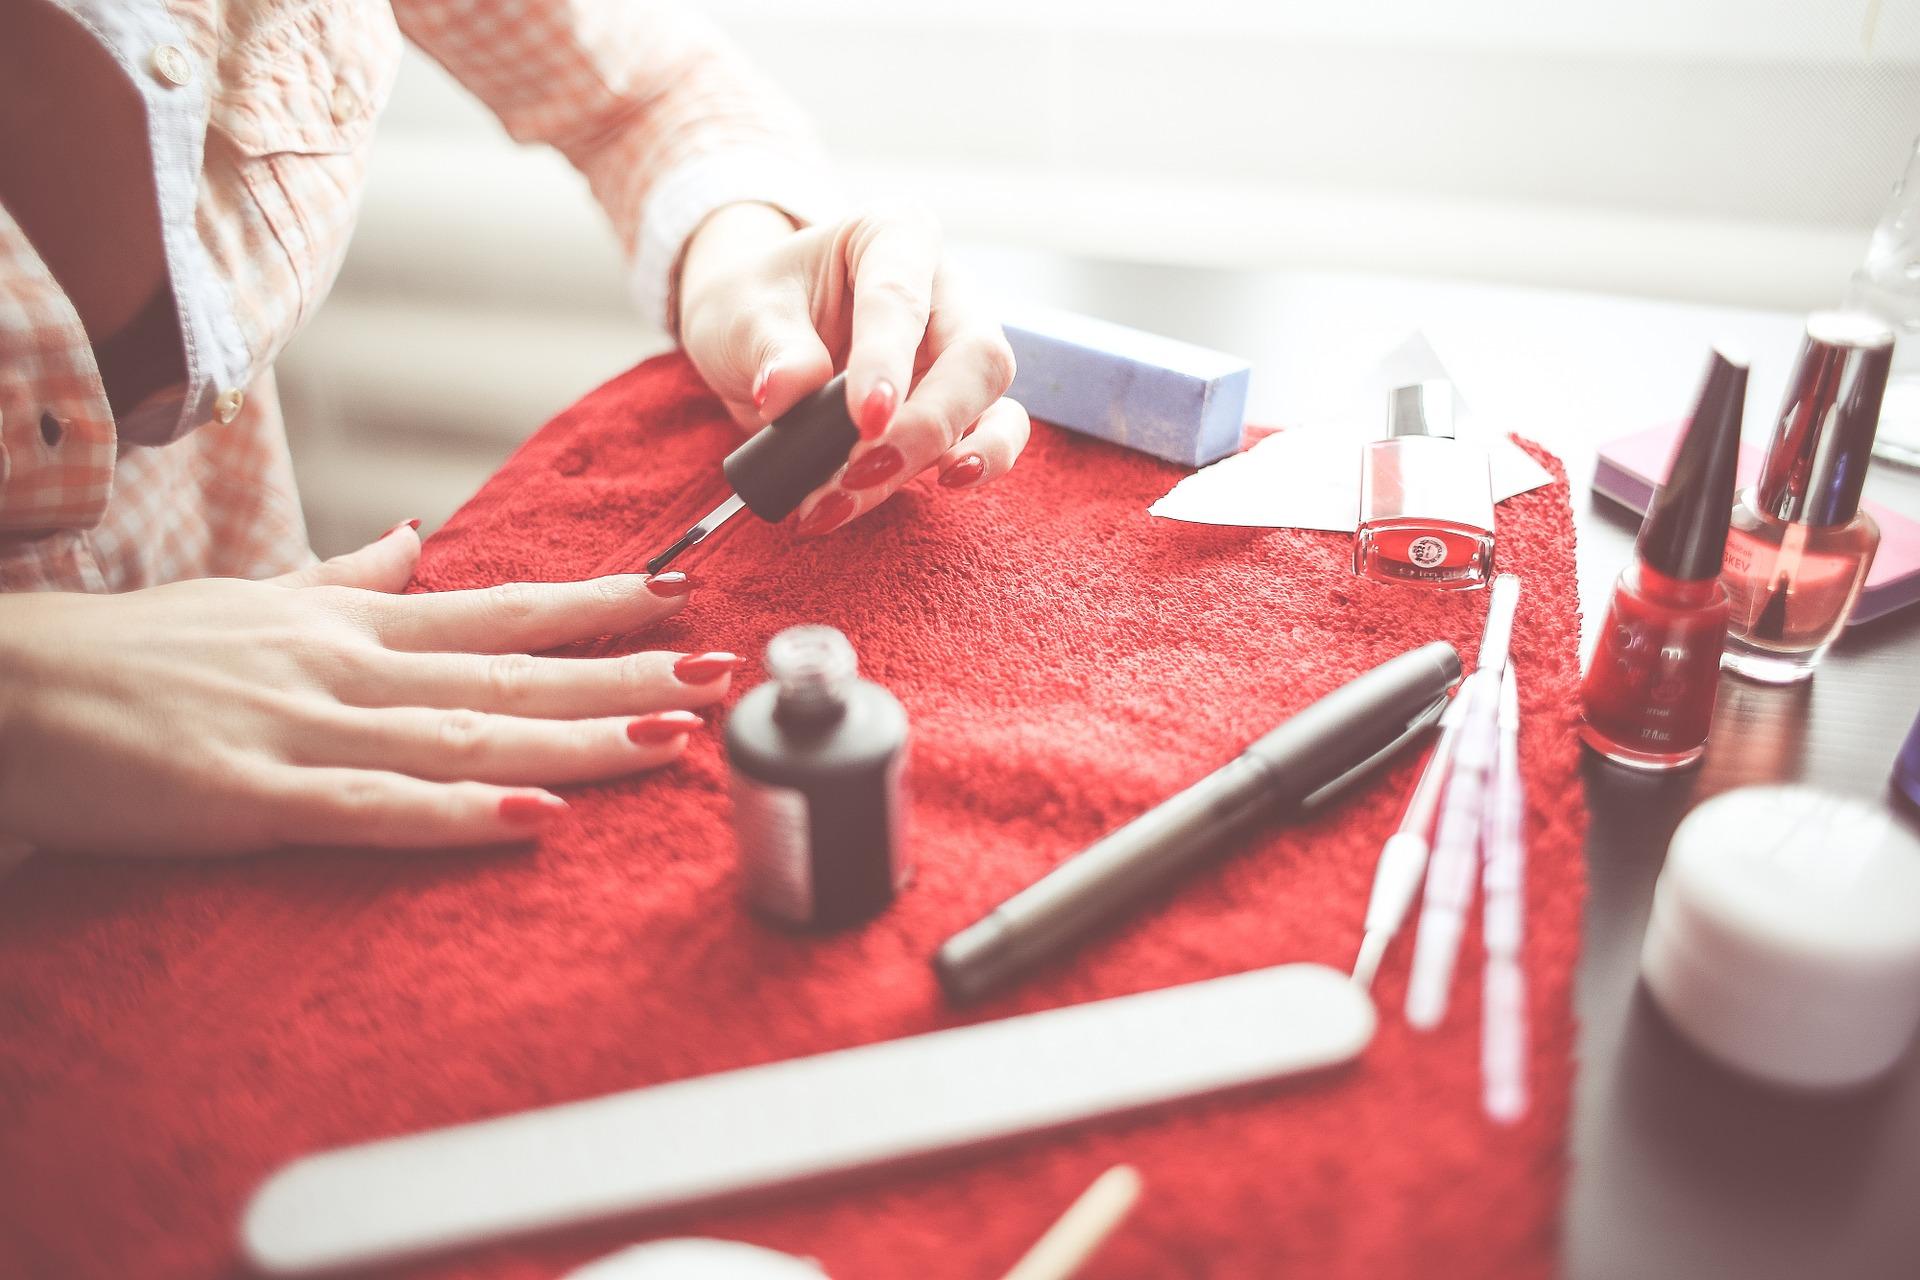 Piękne paznokcie to atrybut kobiecości